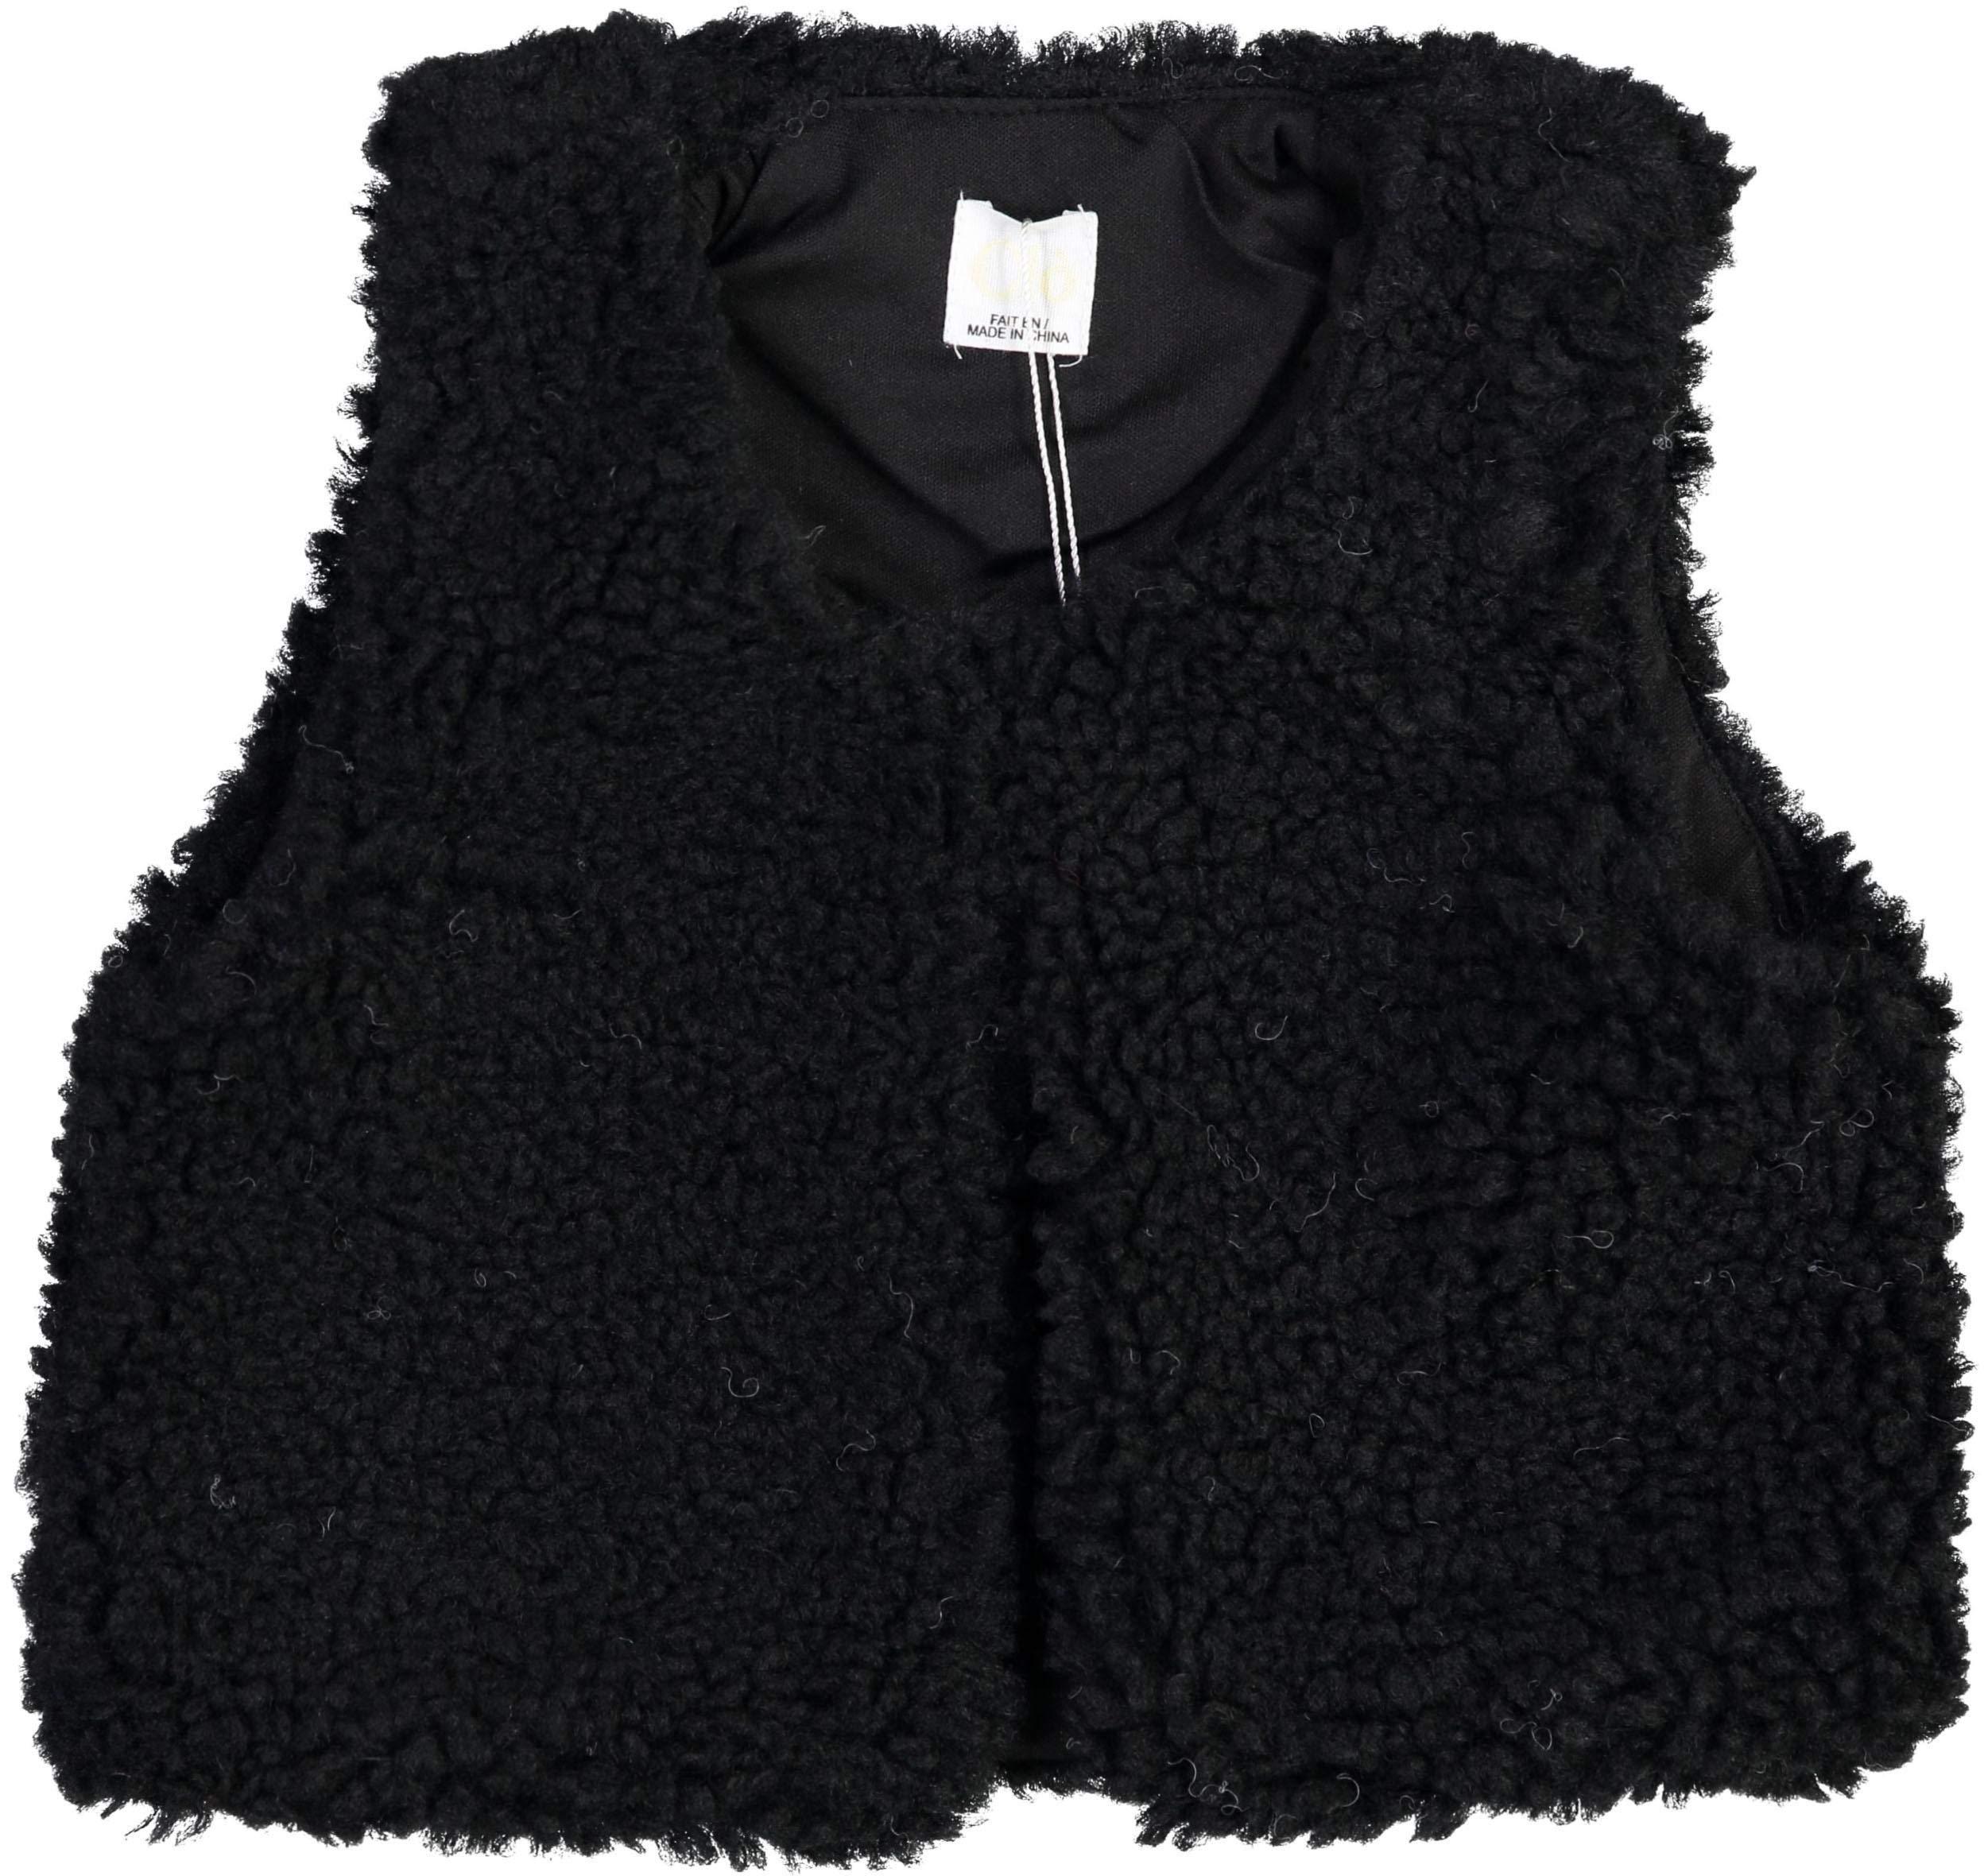 Clo Boys Girls Unisex Baby Sherpa Vest - WA9CP4009V - Black, 9 Months by Clo